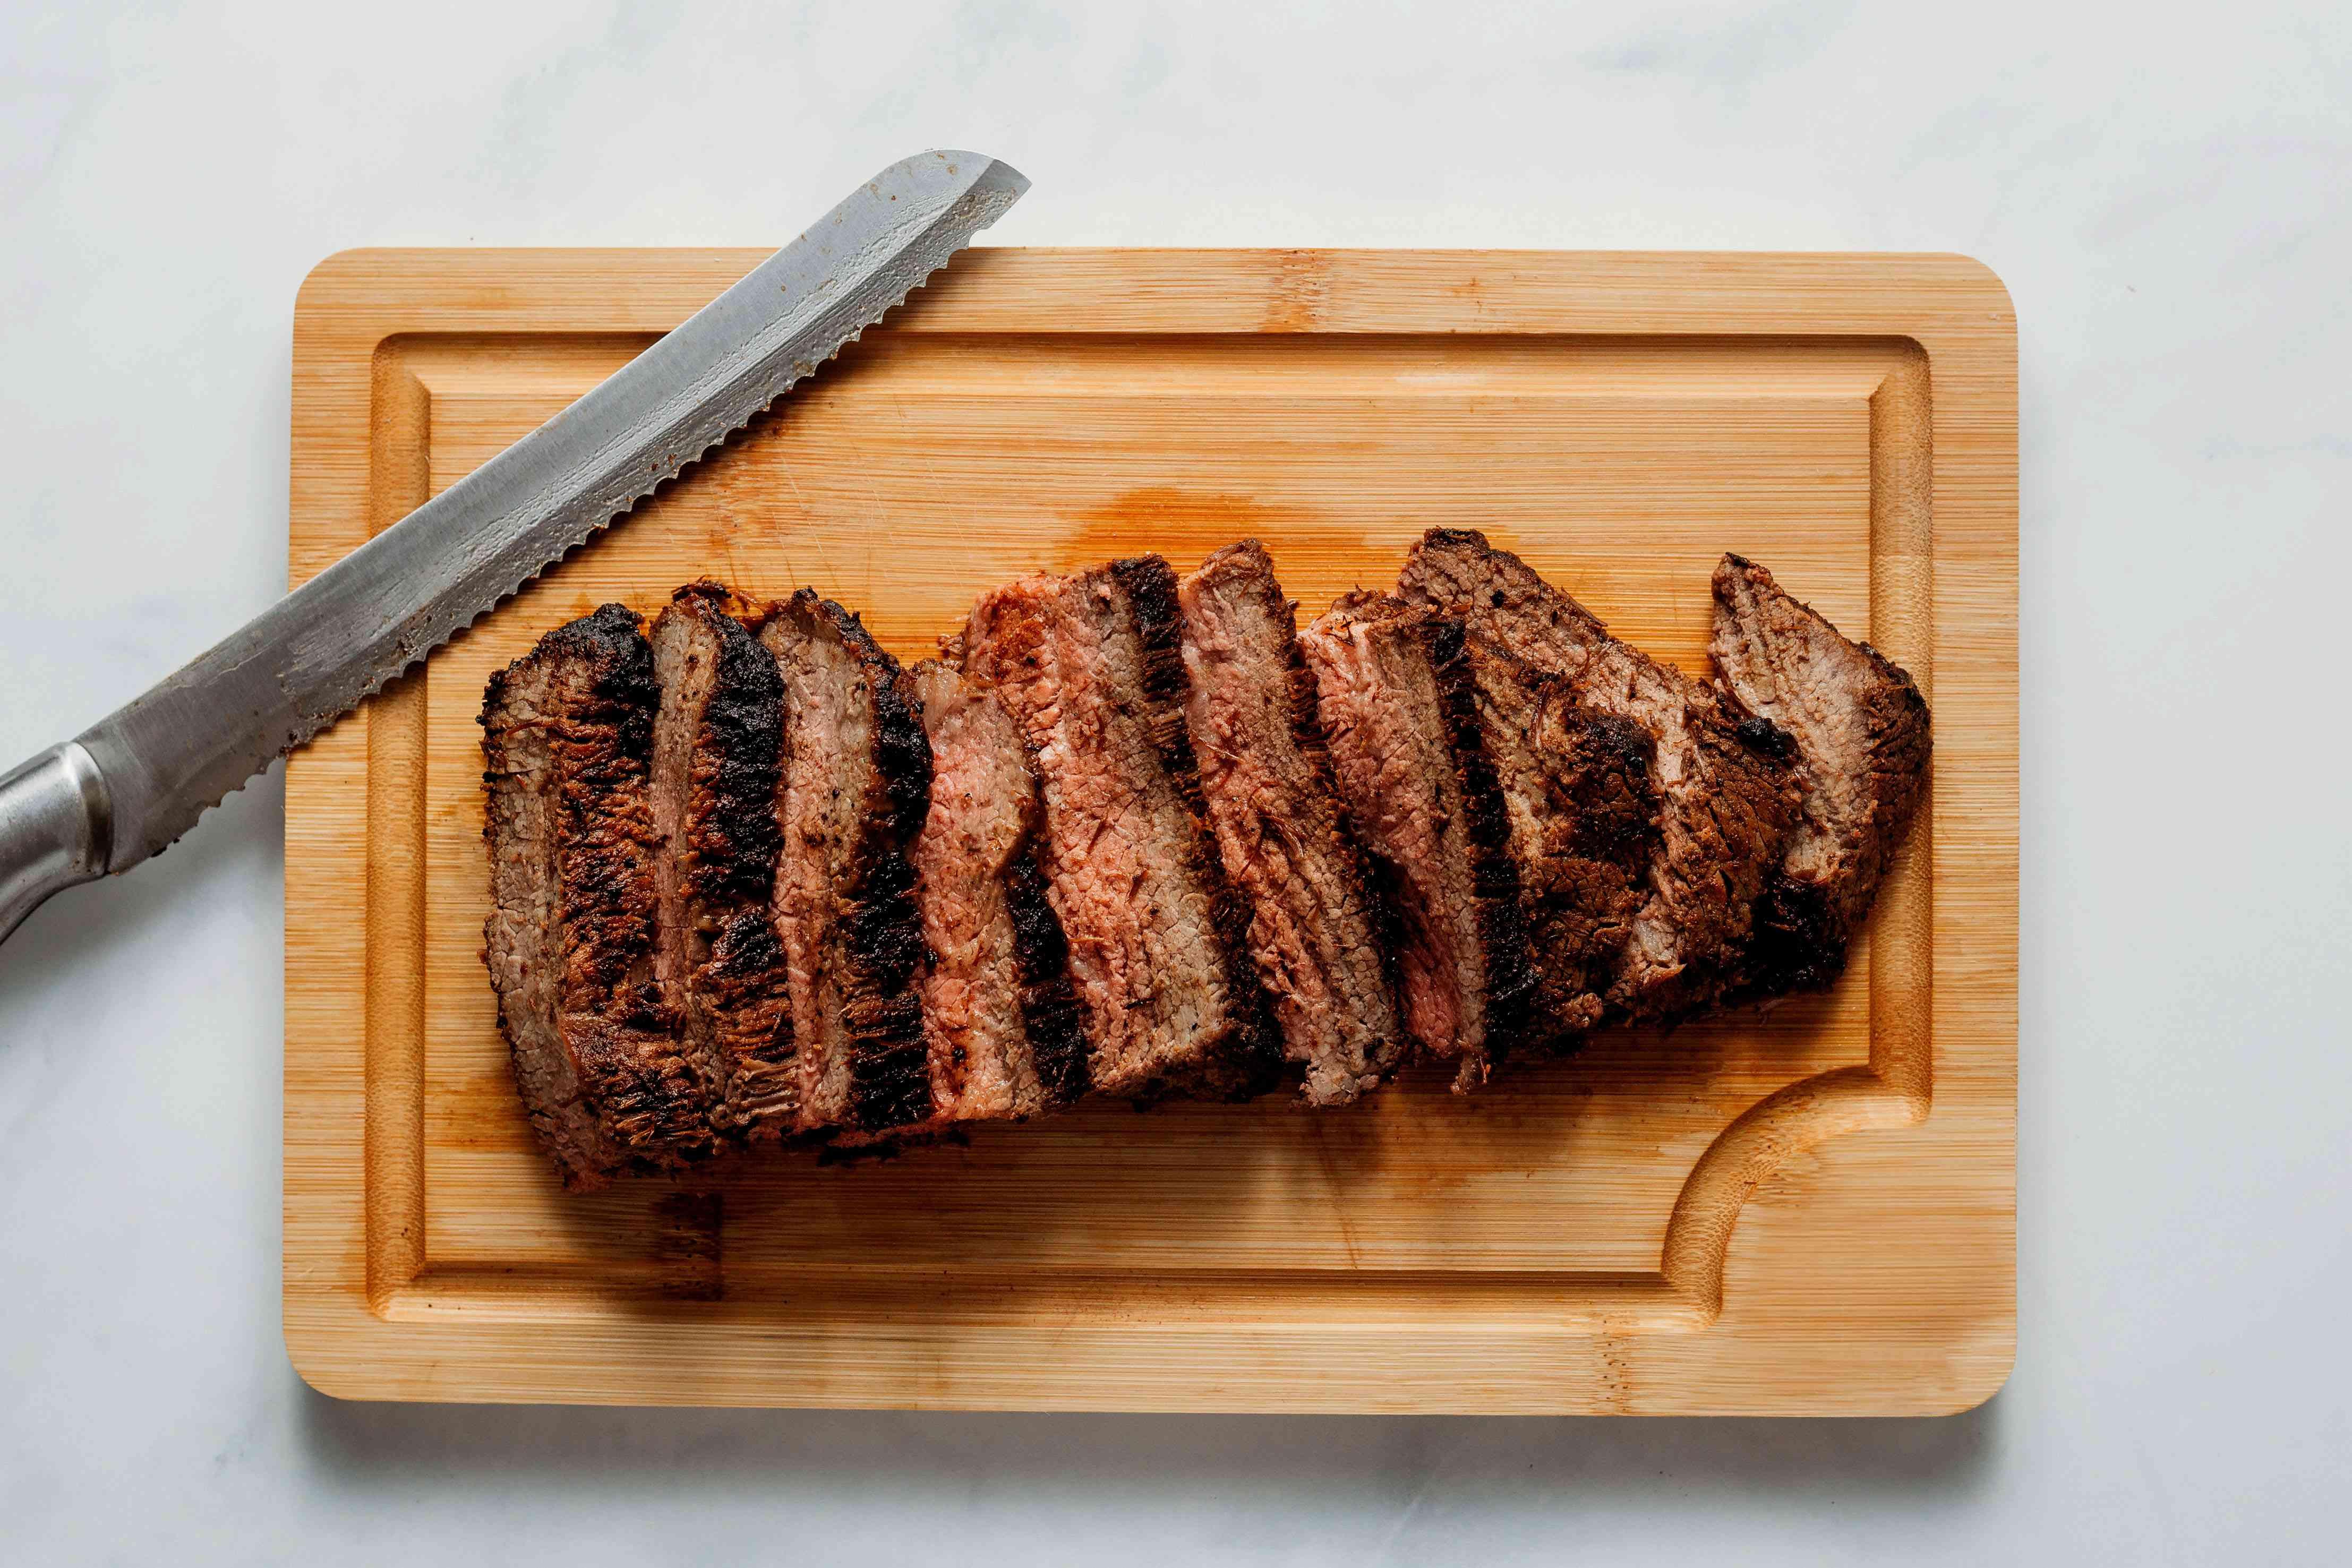 sliced steak on a cutting board